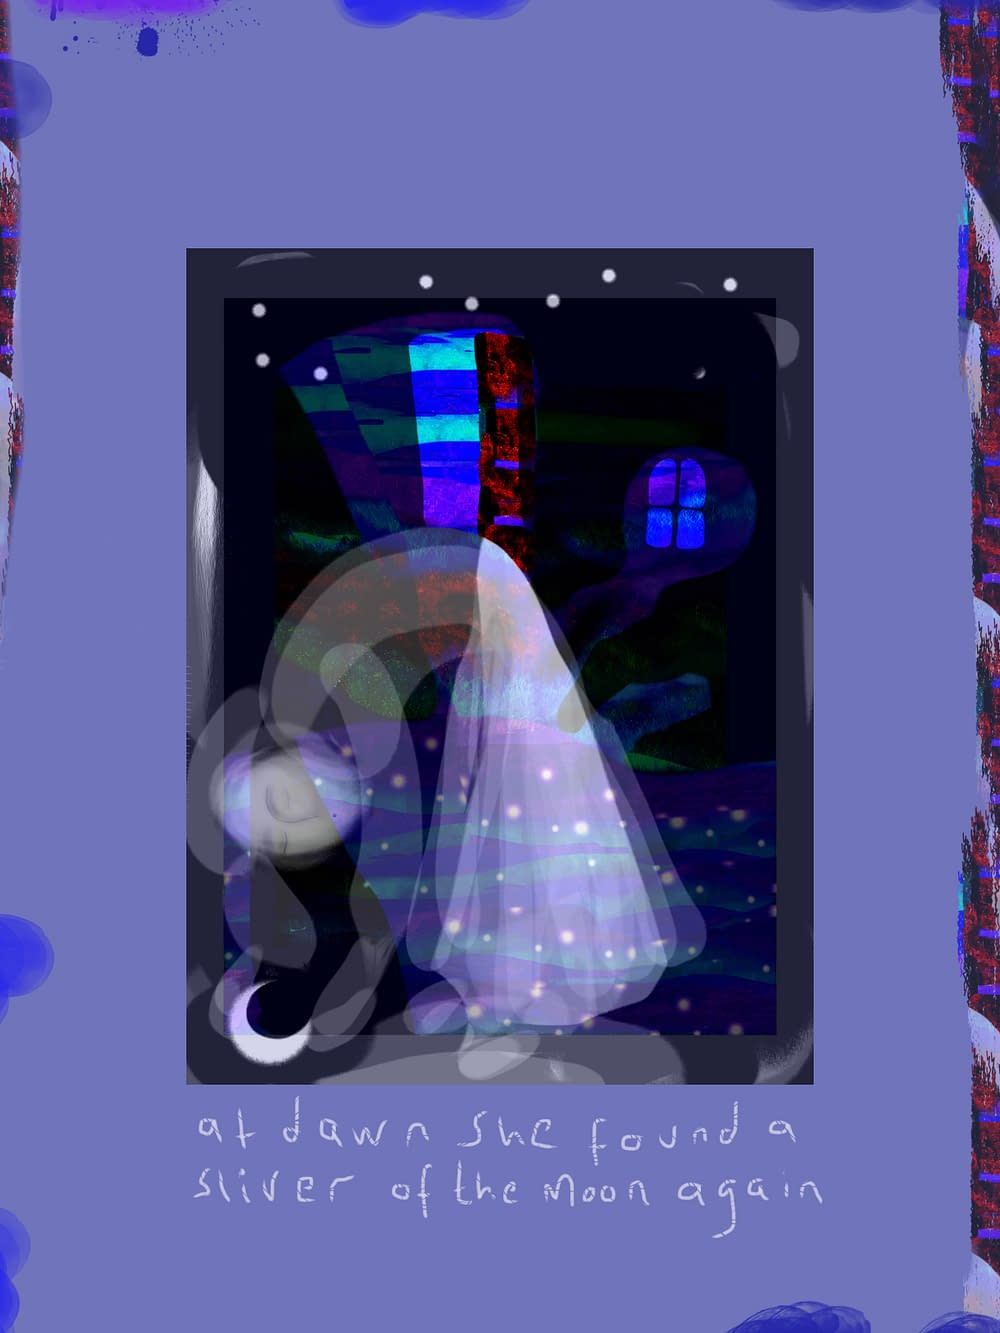 Illustration Malion Skinnar The moon was broken